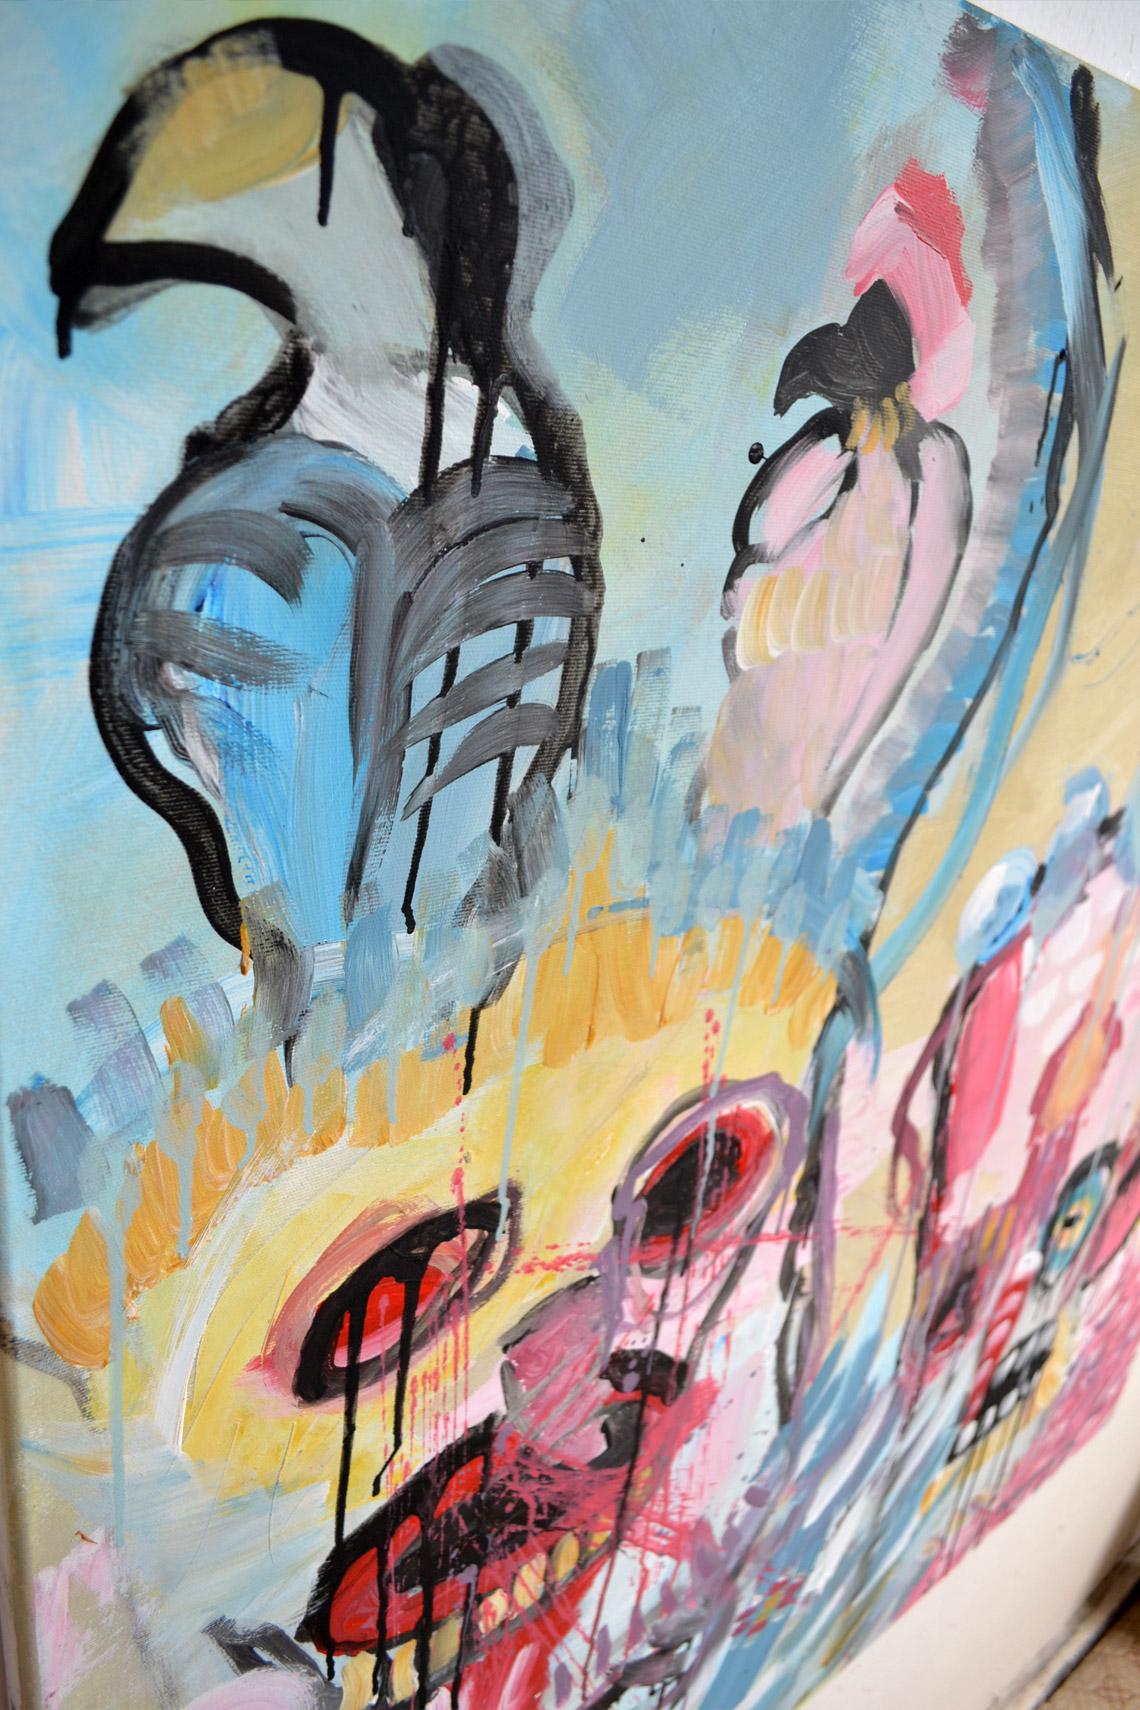 Zemansky Martin painting Carnival no. 01 detail 04